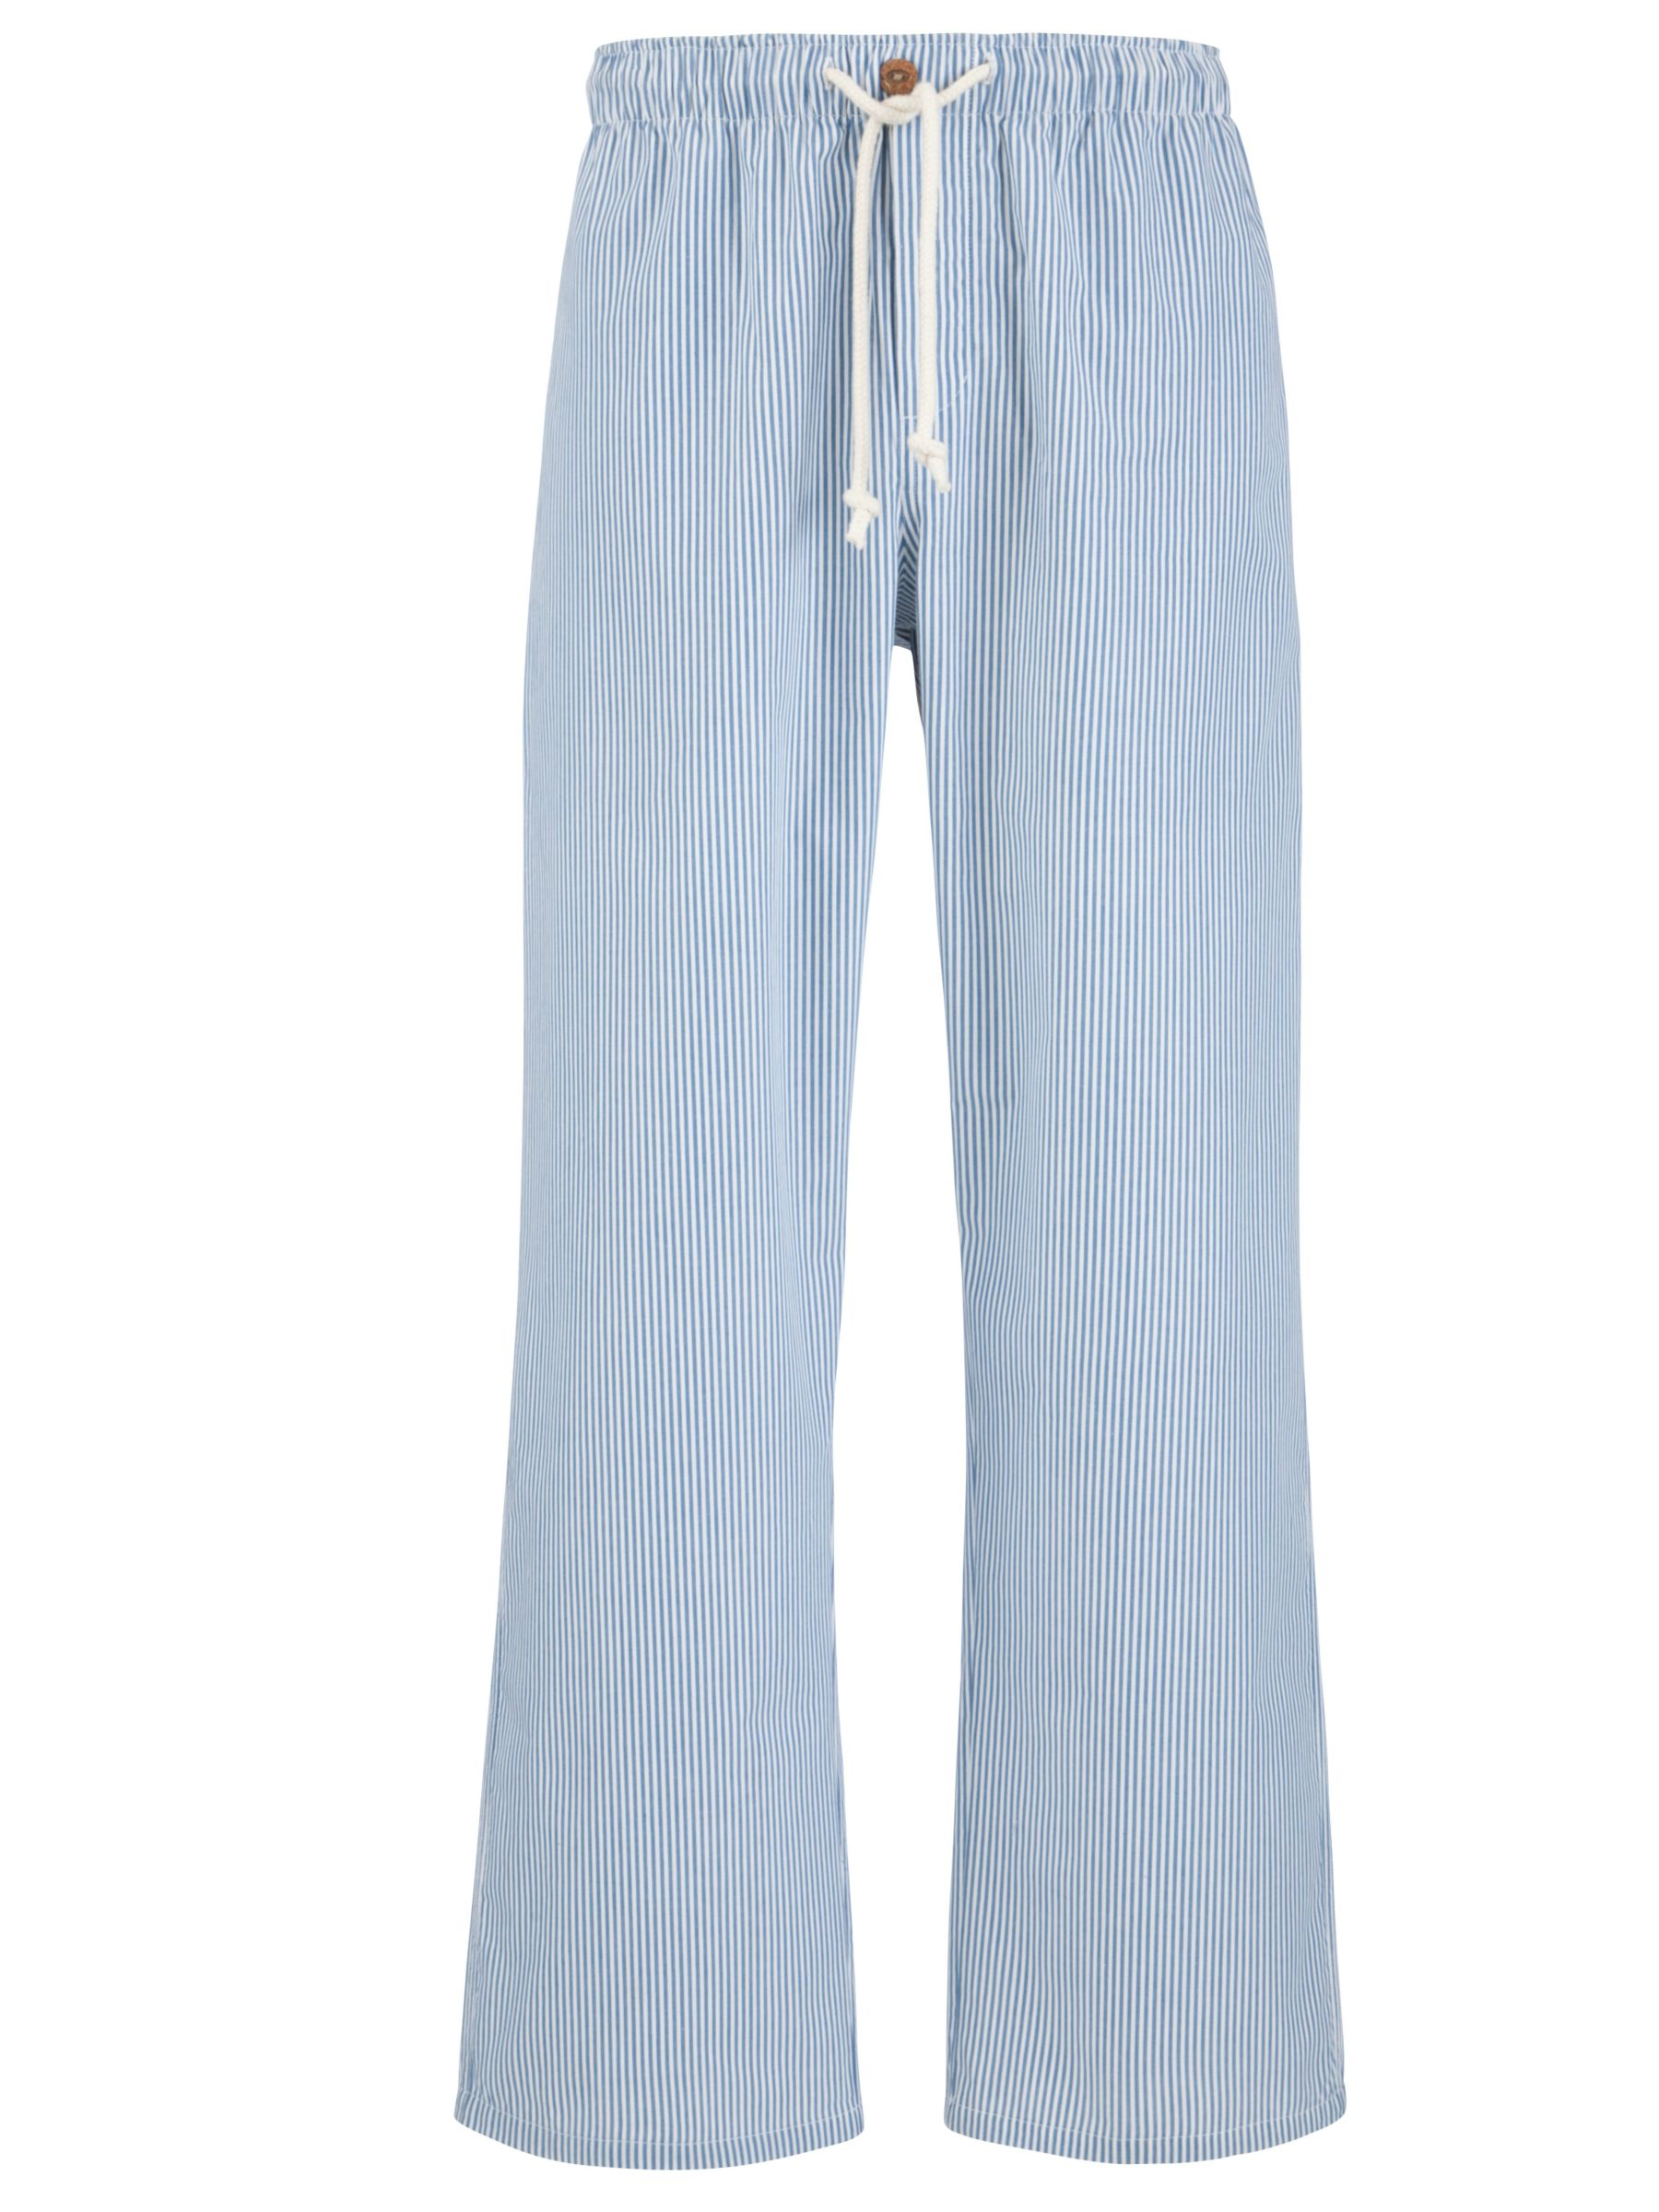 John Lewis Jake Fine Stripe Pyjama Pants, Navy